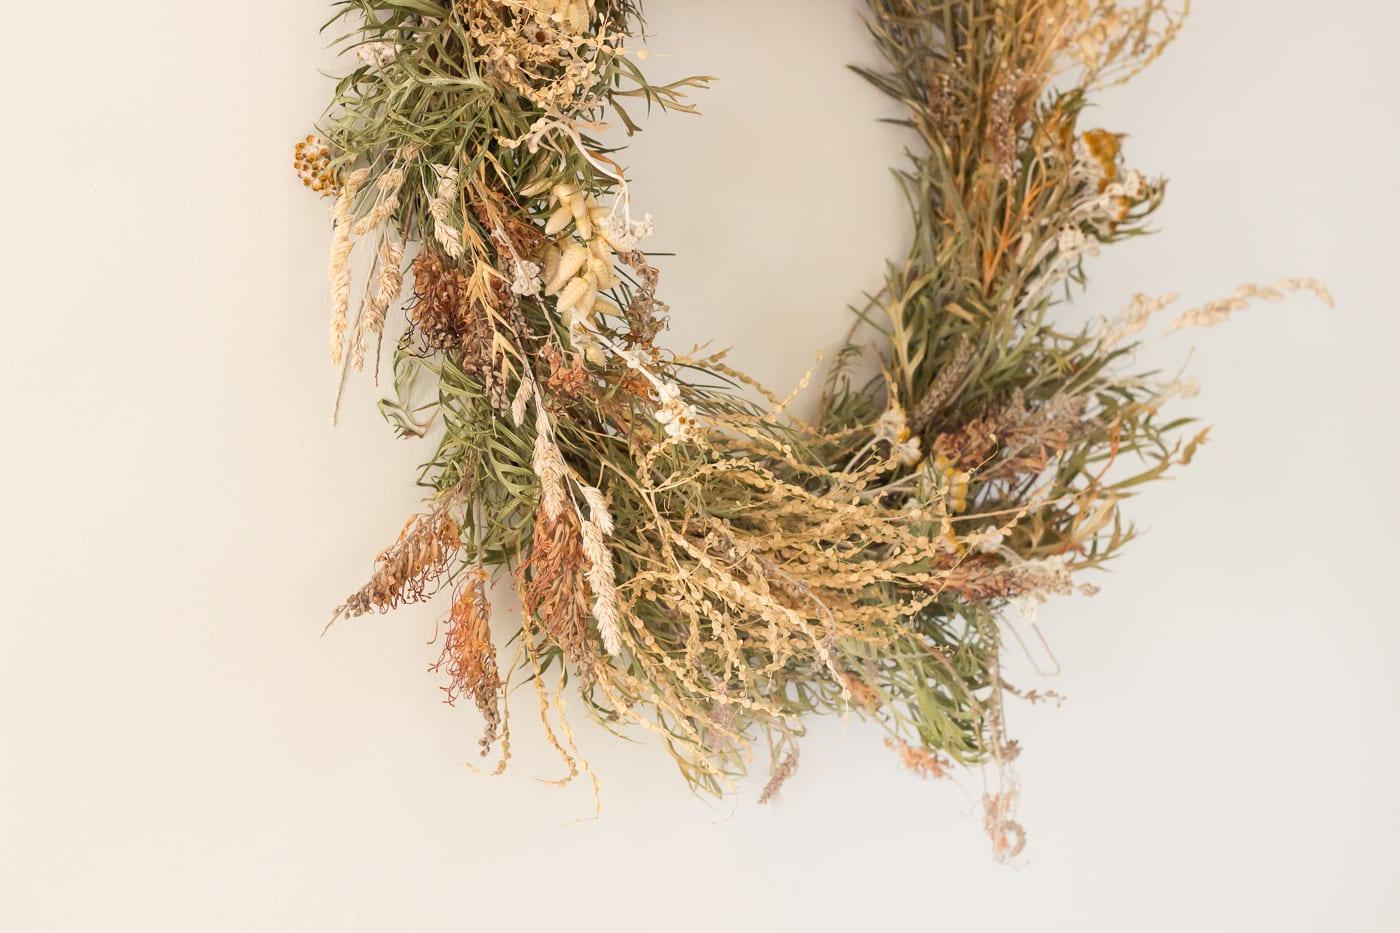 Banksia wreath3 (1 of 1)